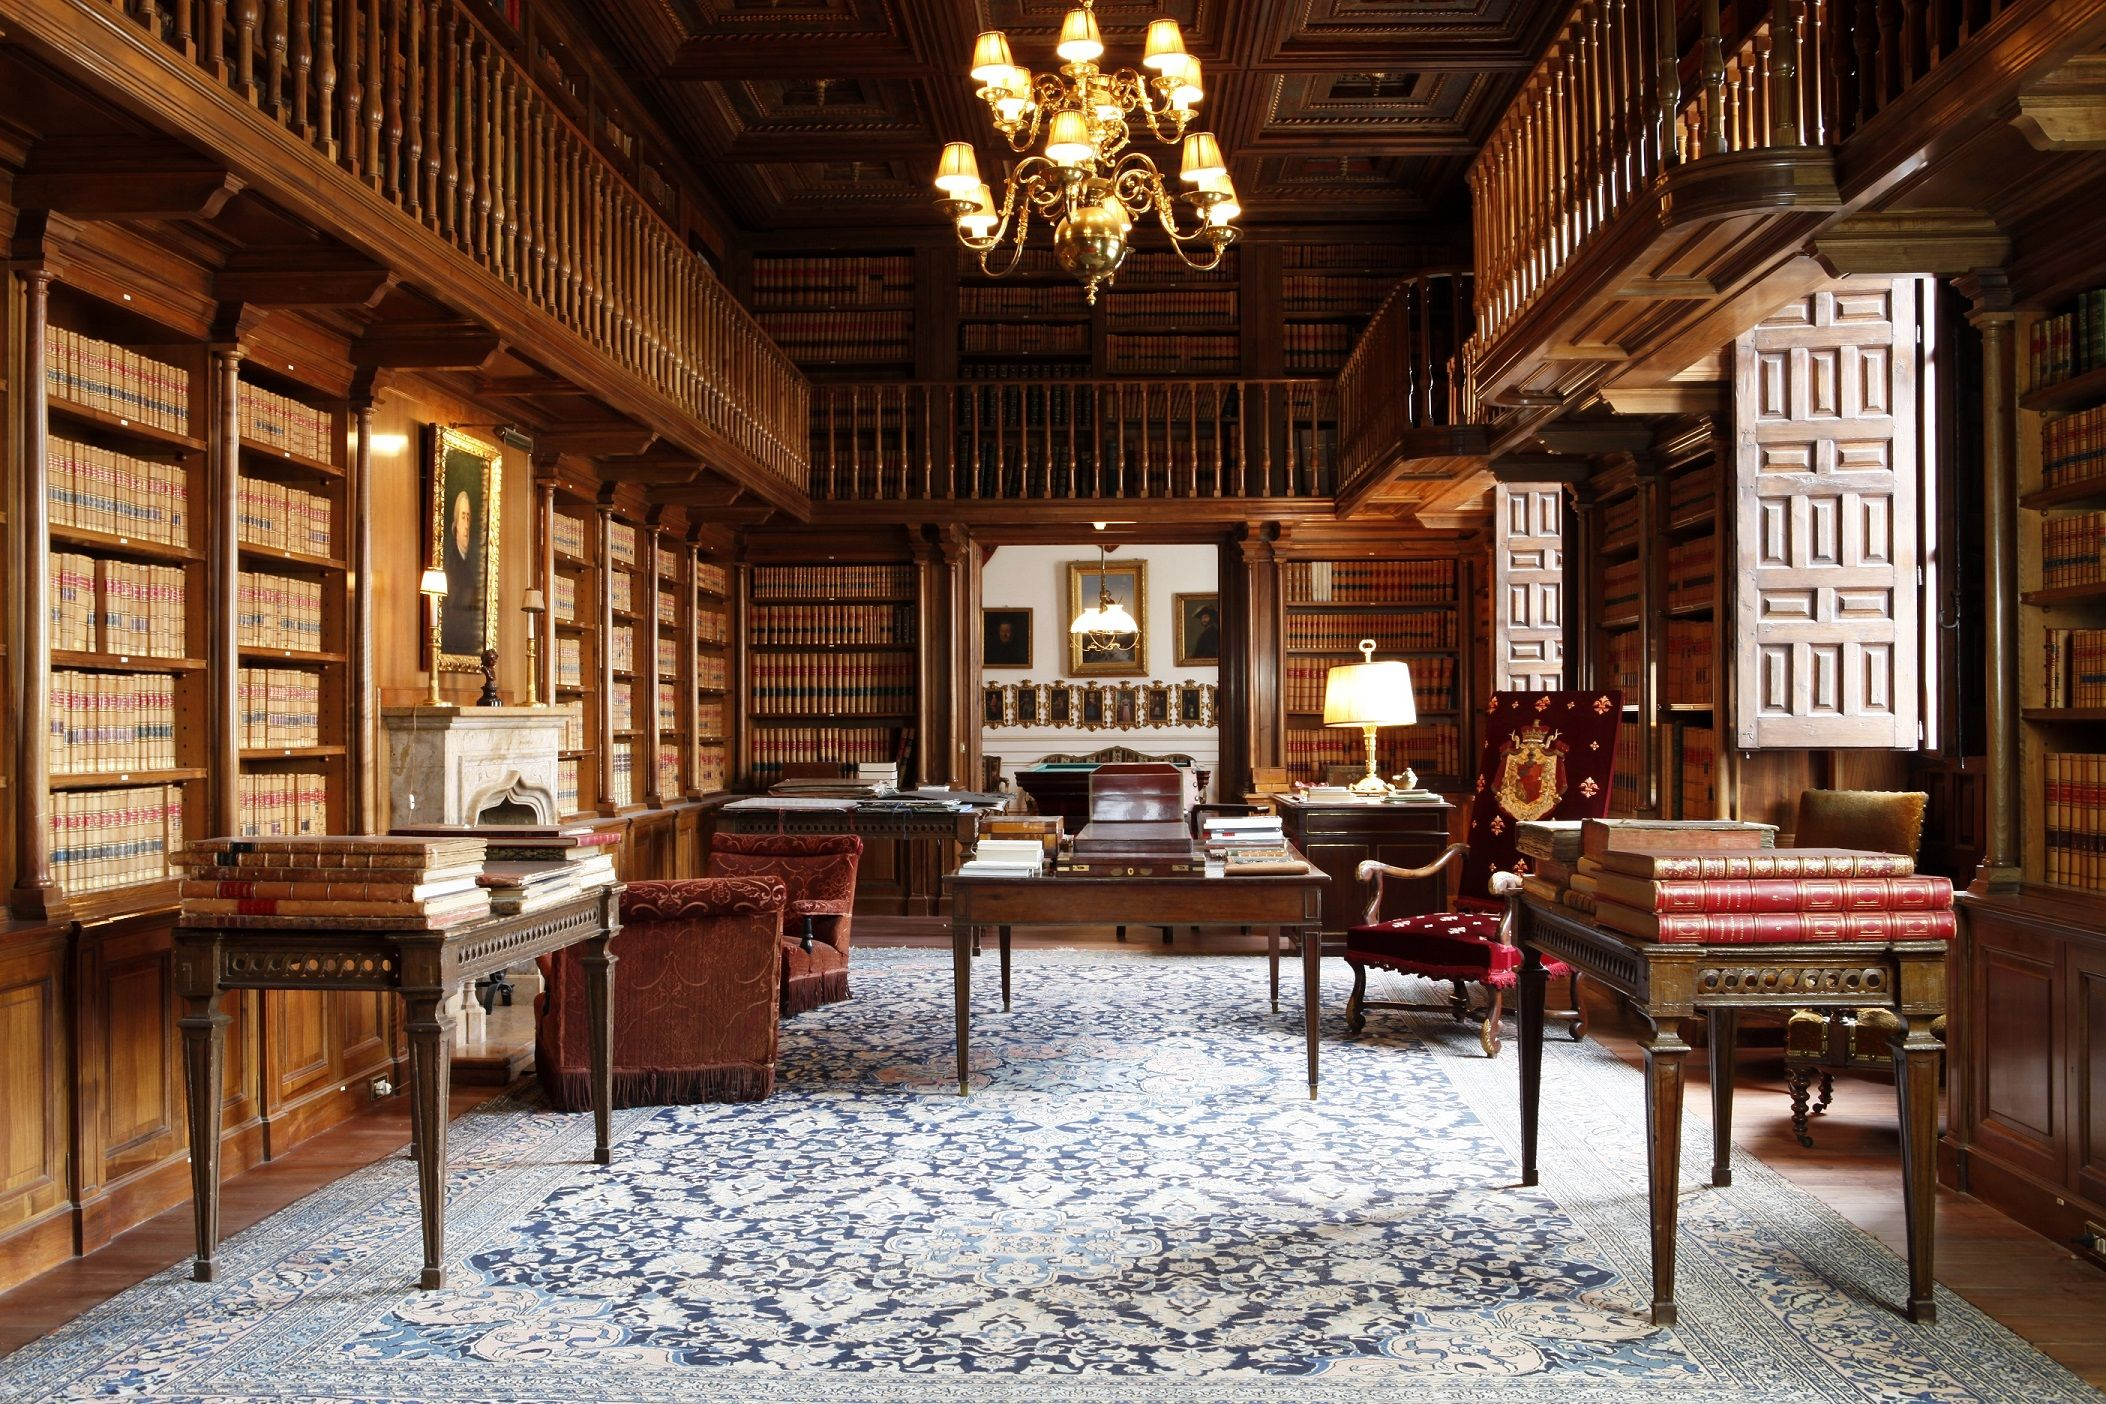 Palacio De Villahermosa Http Www Palaciodevillahermosa Com Wp  # Muebles Duquesa Villahermosa Zaragoza